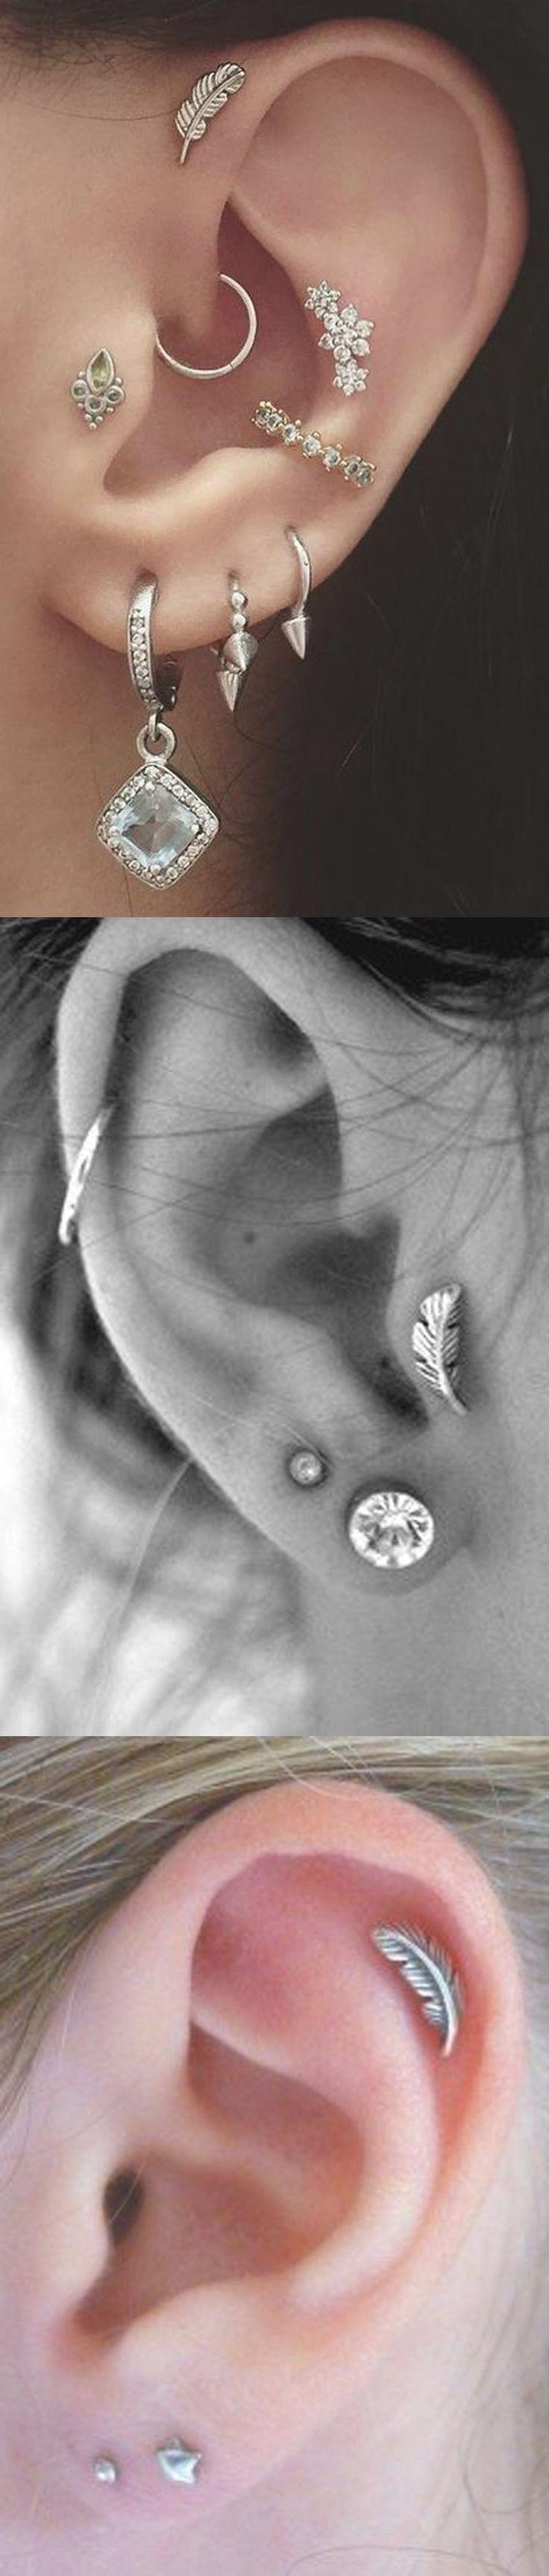 Nose piercing earrings  Aria Leaf Earring Piercing Jewelry G Stud  Piercings Ear